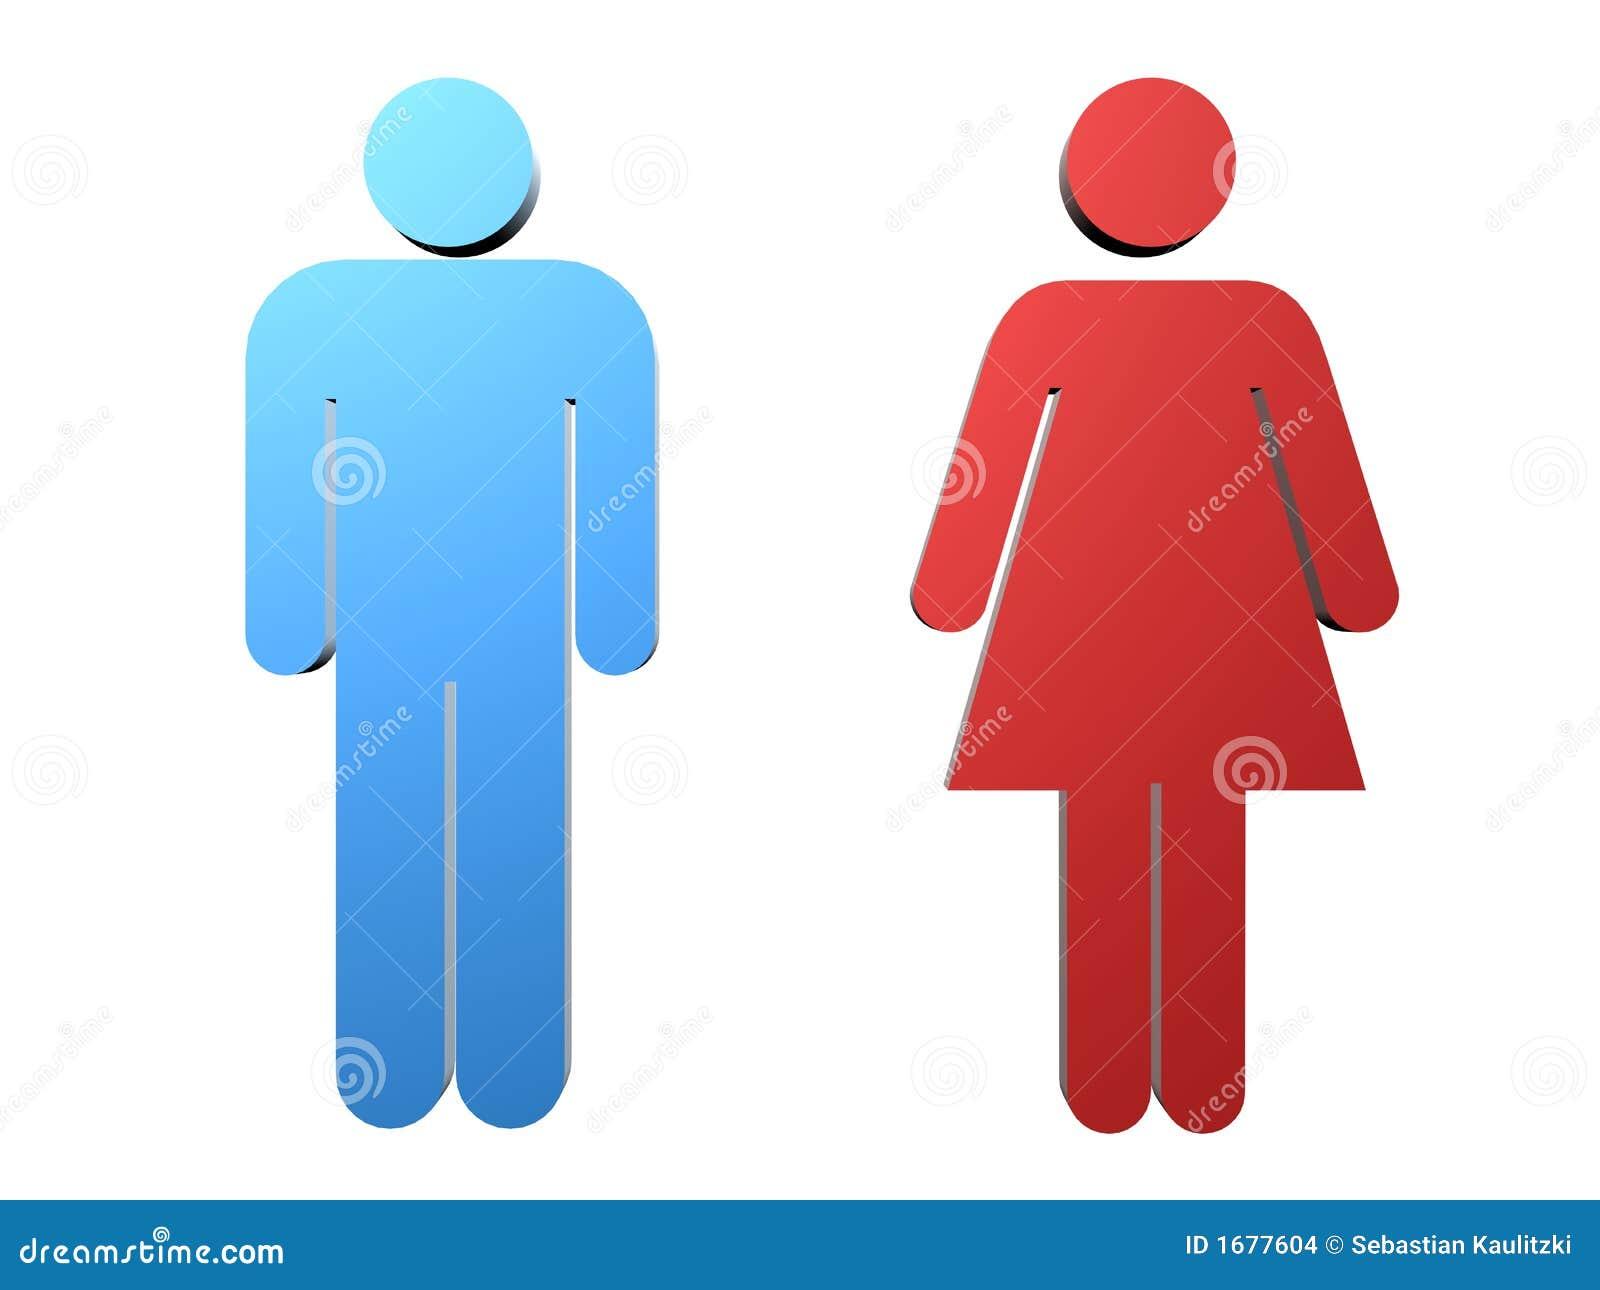 Male females iphone pic 83